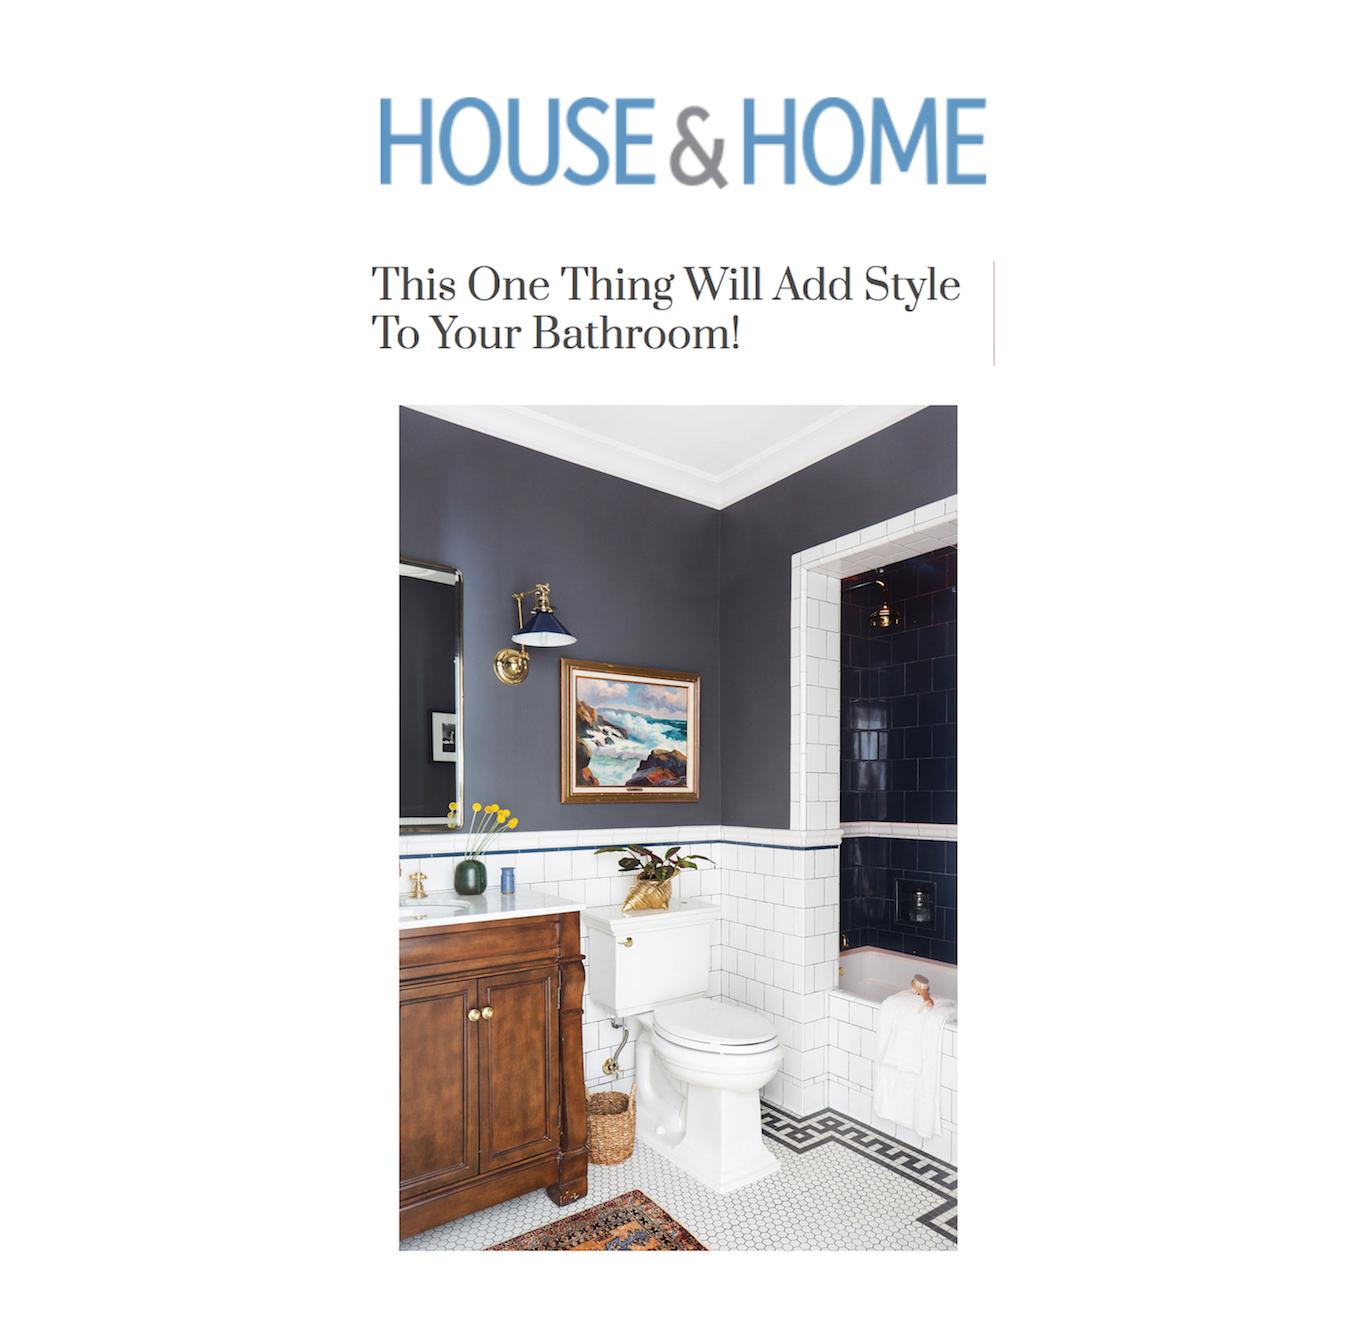 HOUSE_HOME